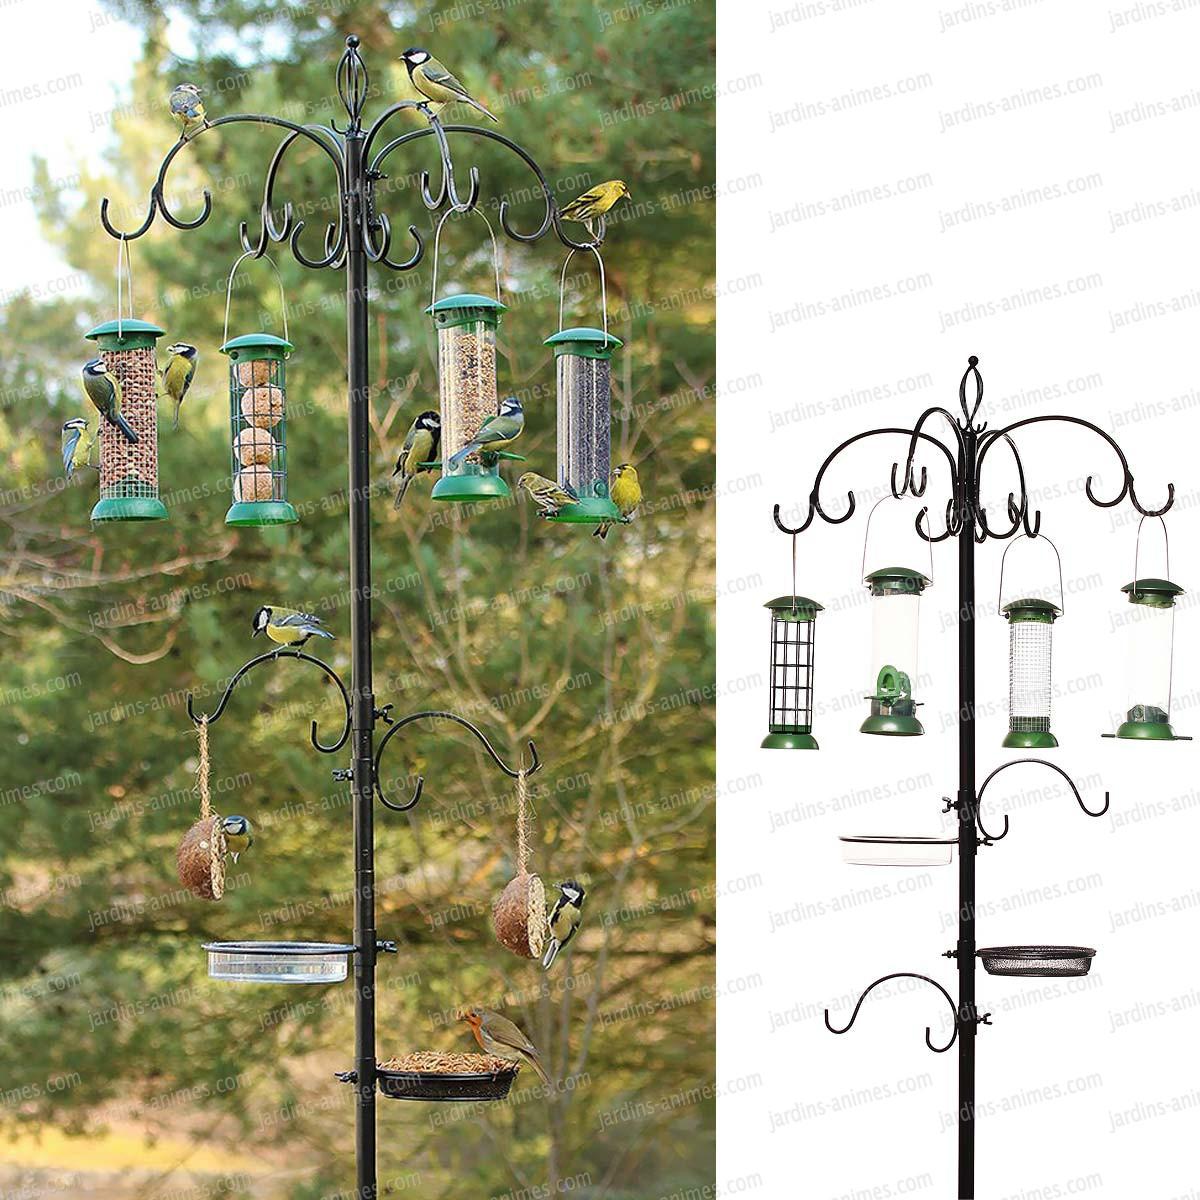 comment chasser les oiseaux des arbres. Black Bedroom Furniture Sets. Home Design Ideas